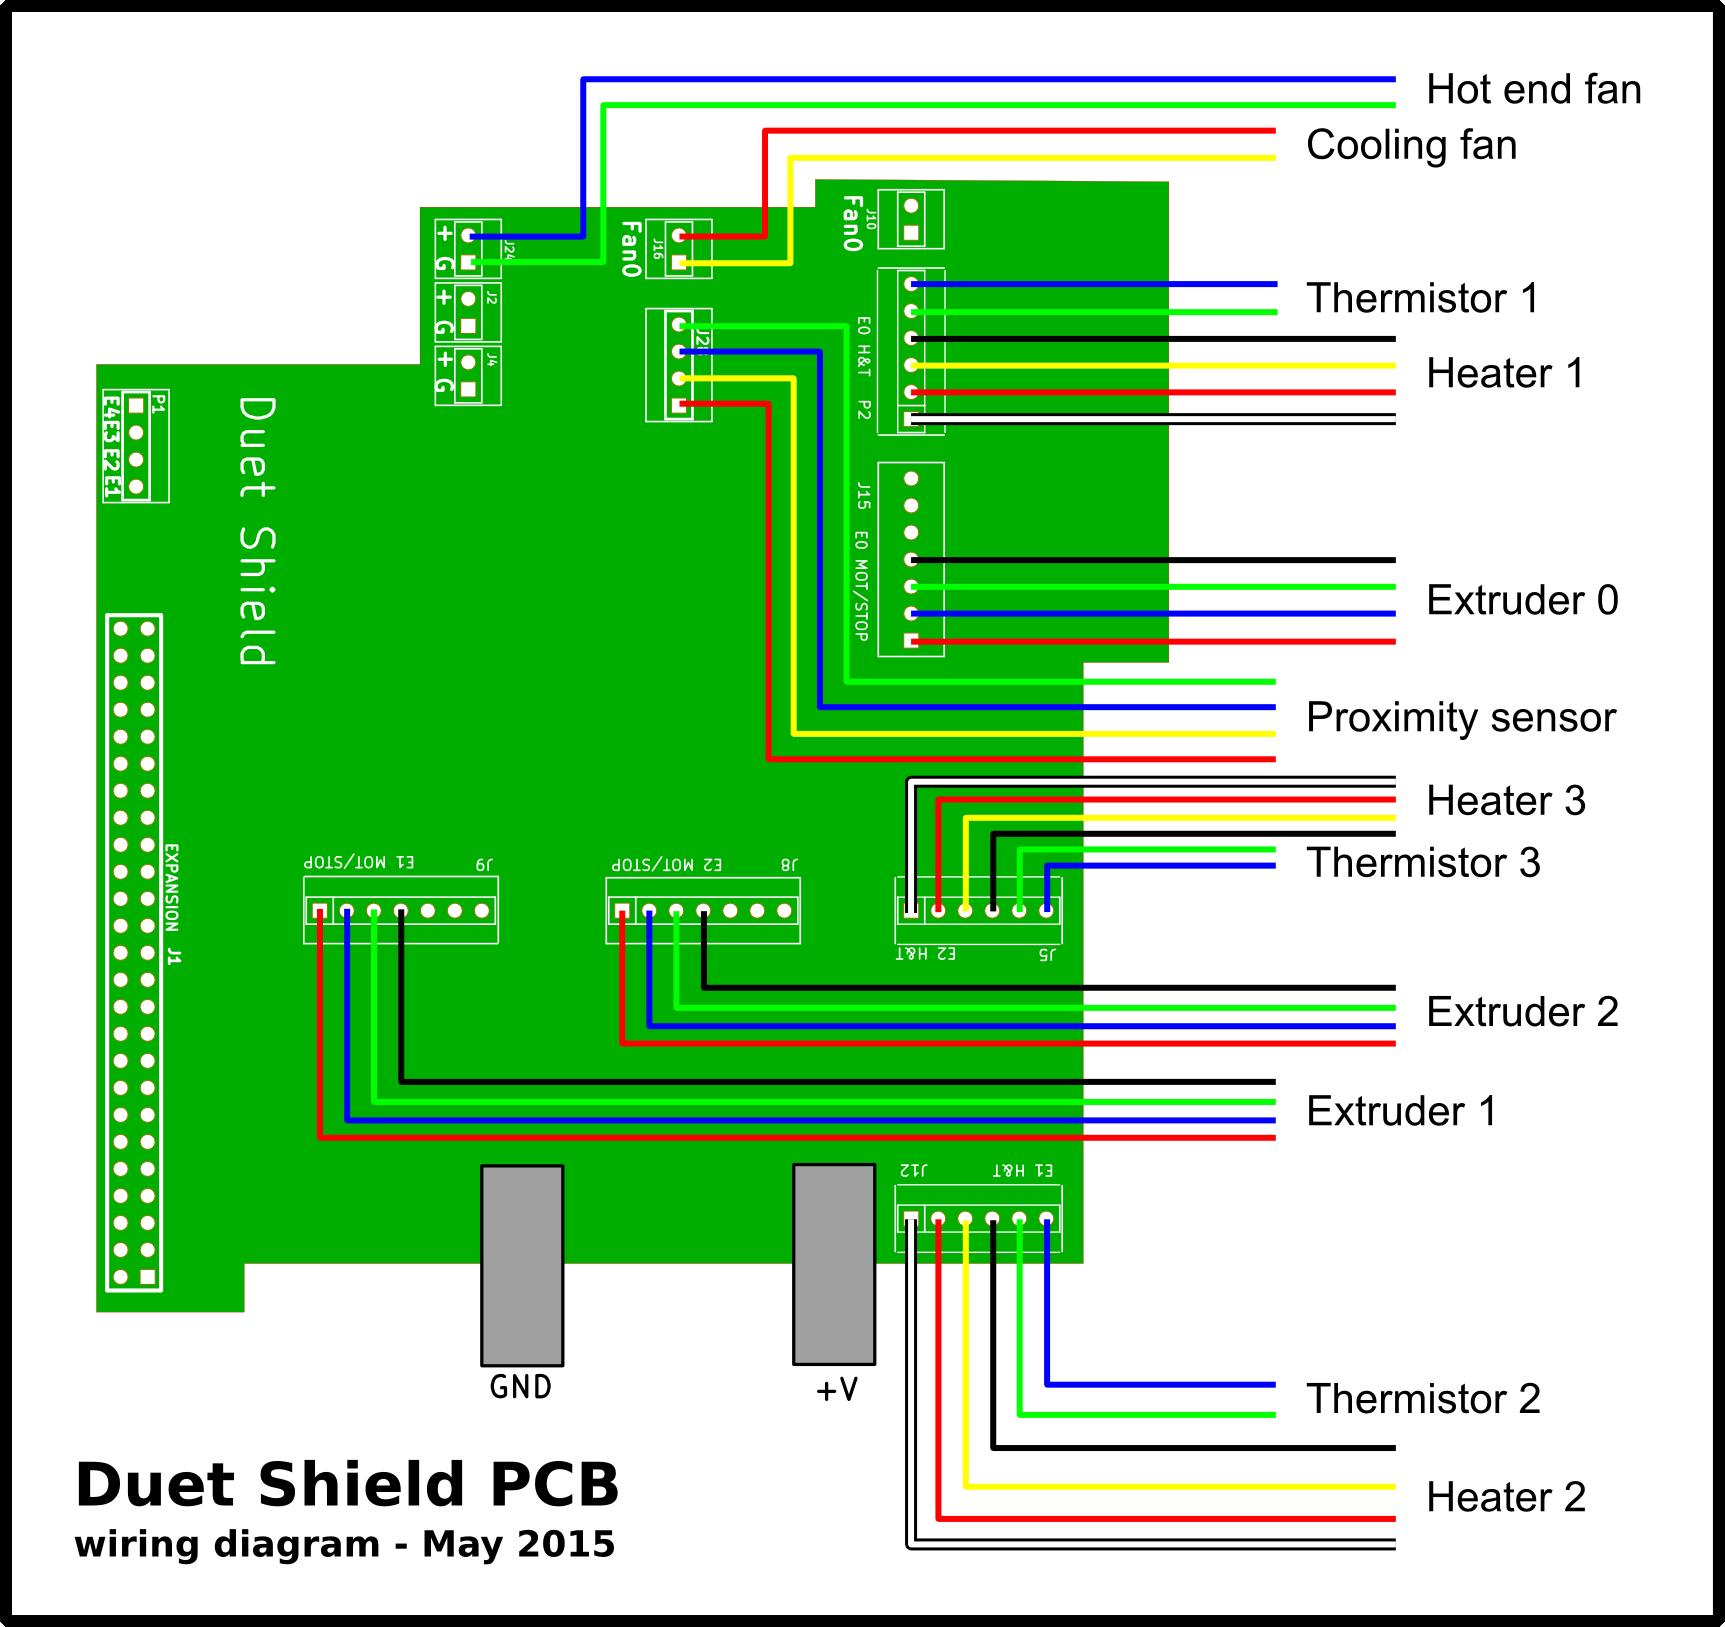 Duet Wiring Diagram from reprapltd.com